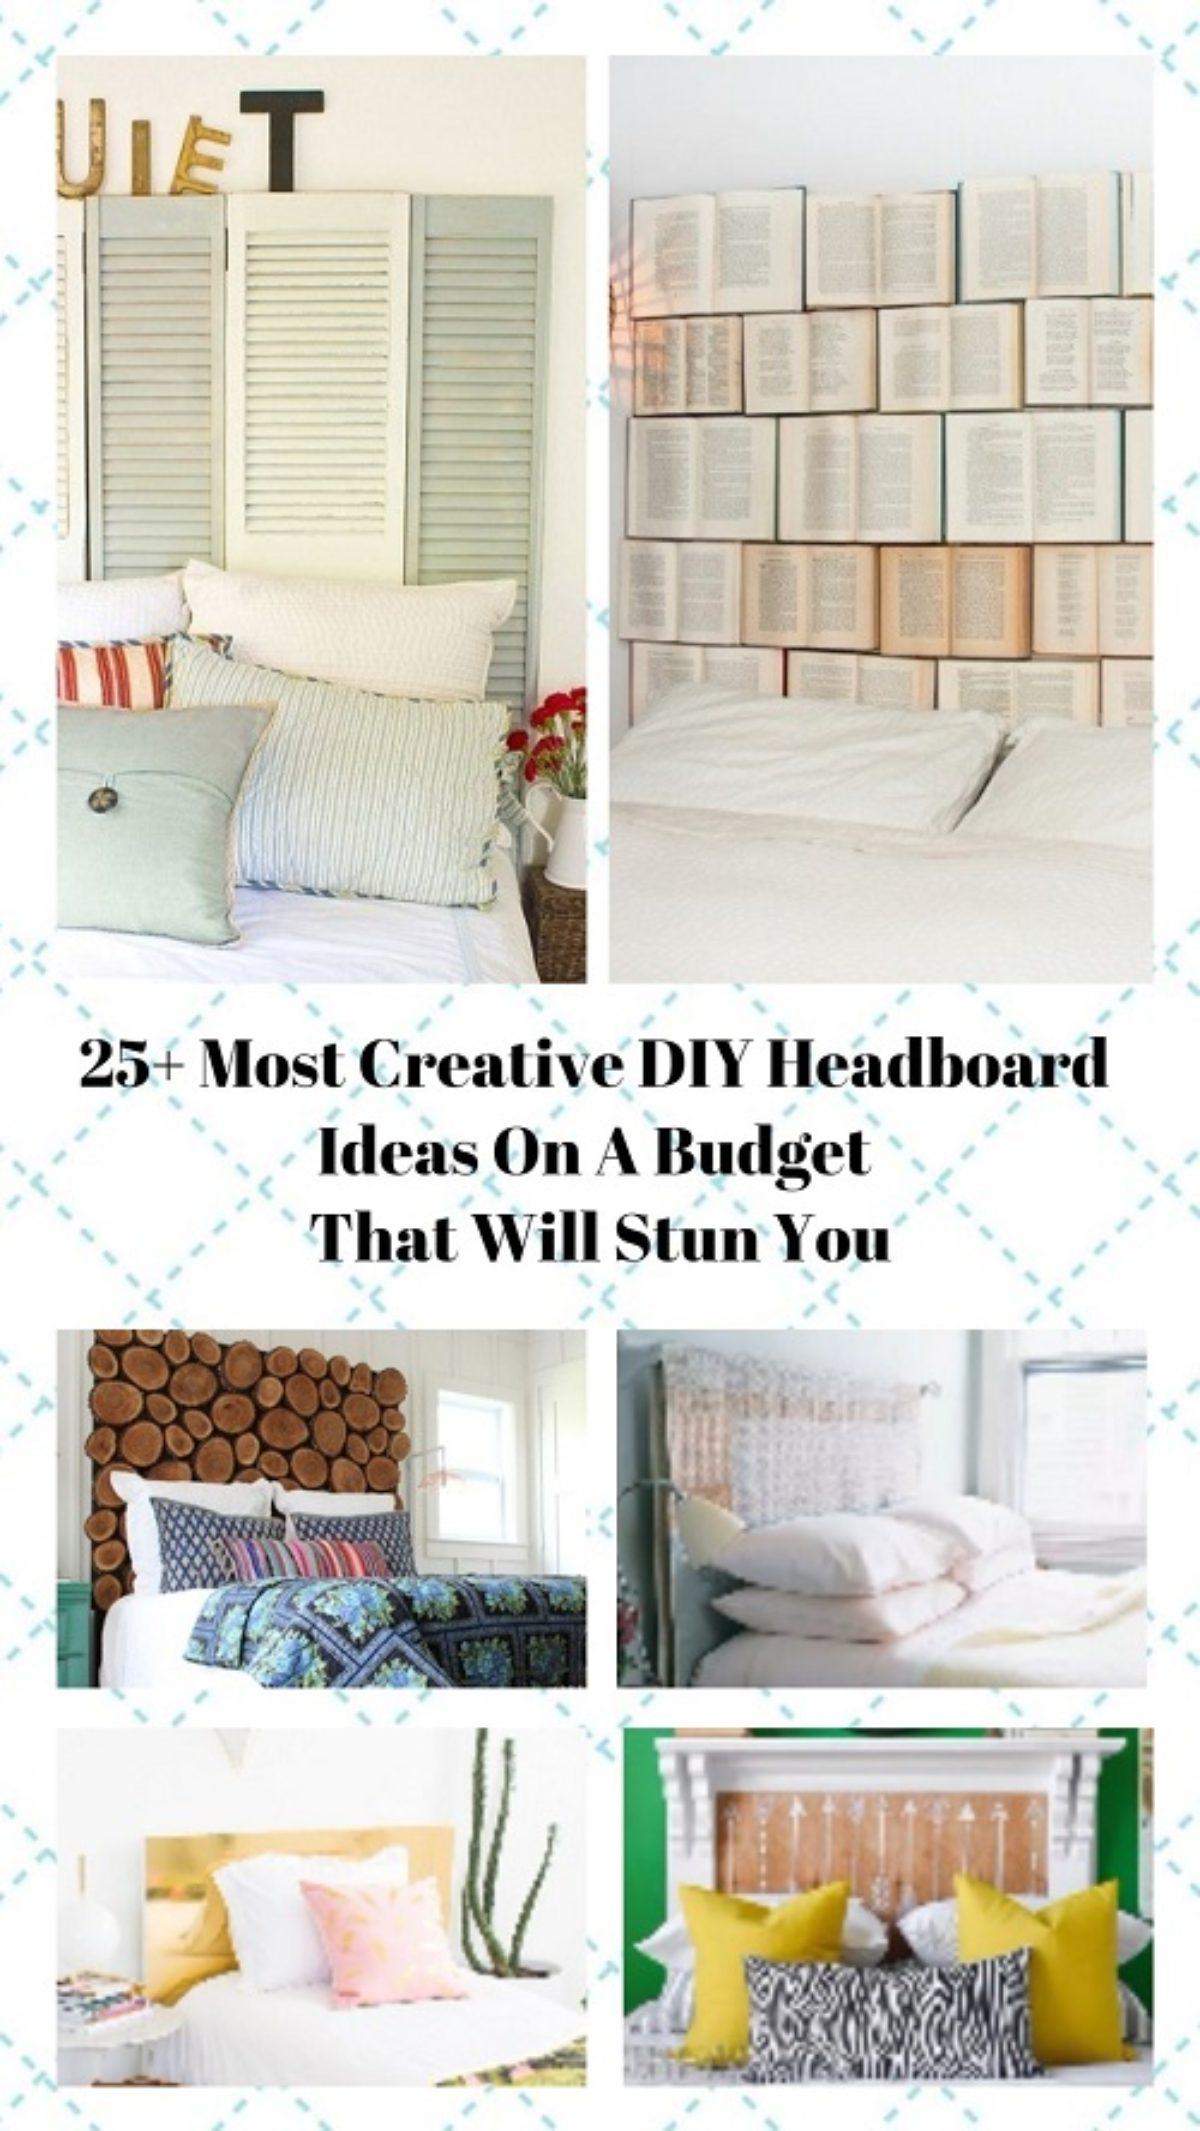 25 Most Creative Diy Headboard Ideas On A Budget That Will Stun You